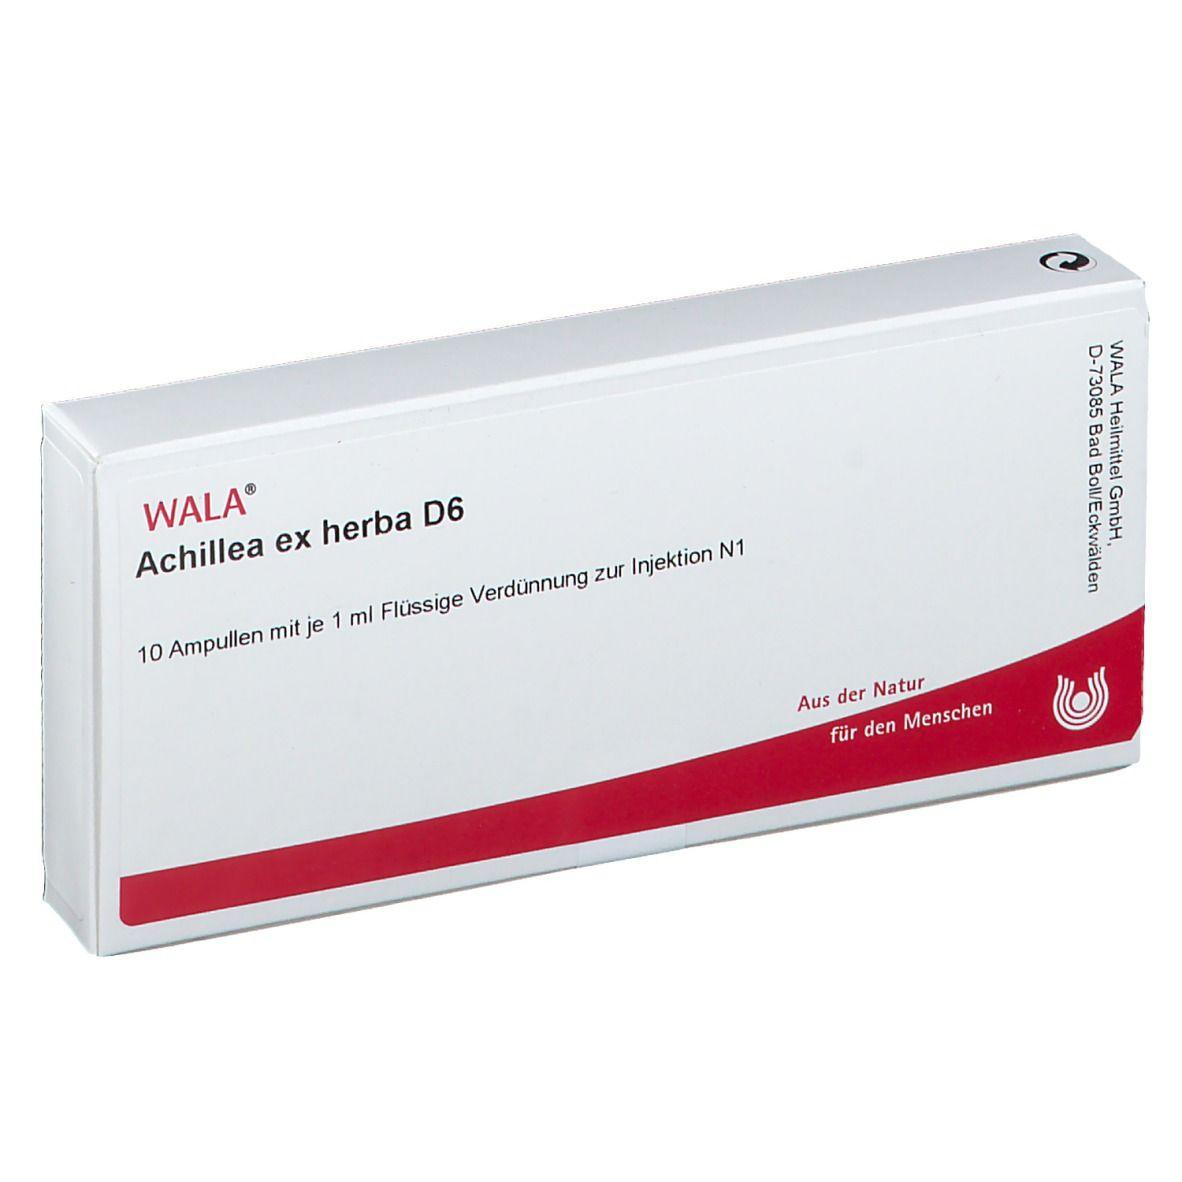 Wala® Achillea ex herba D 6